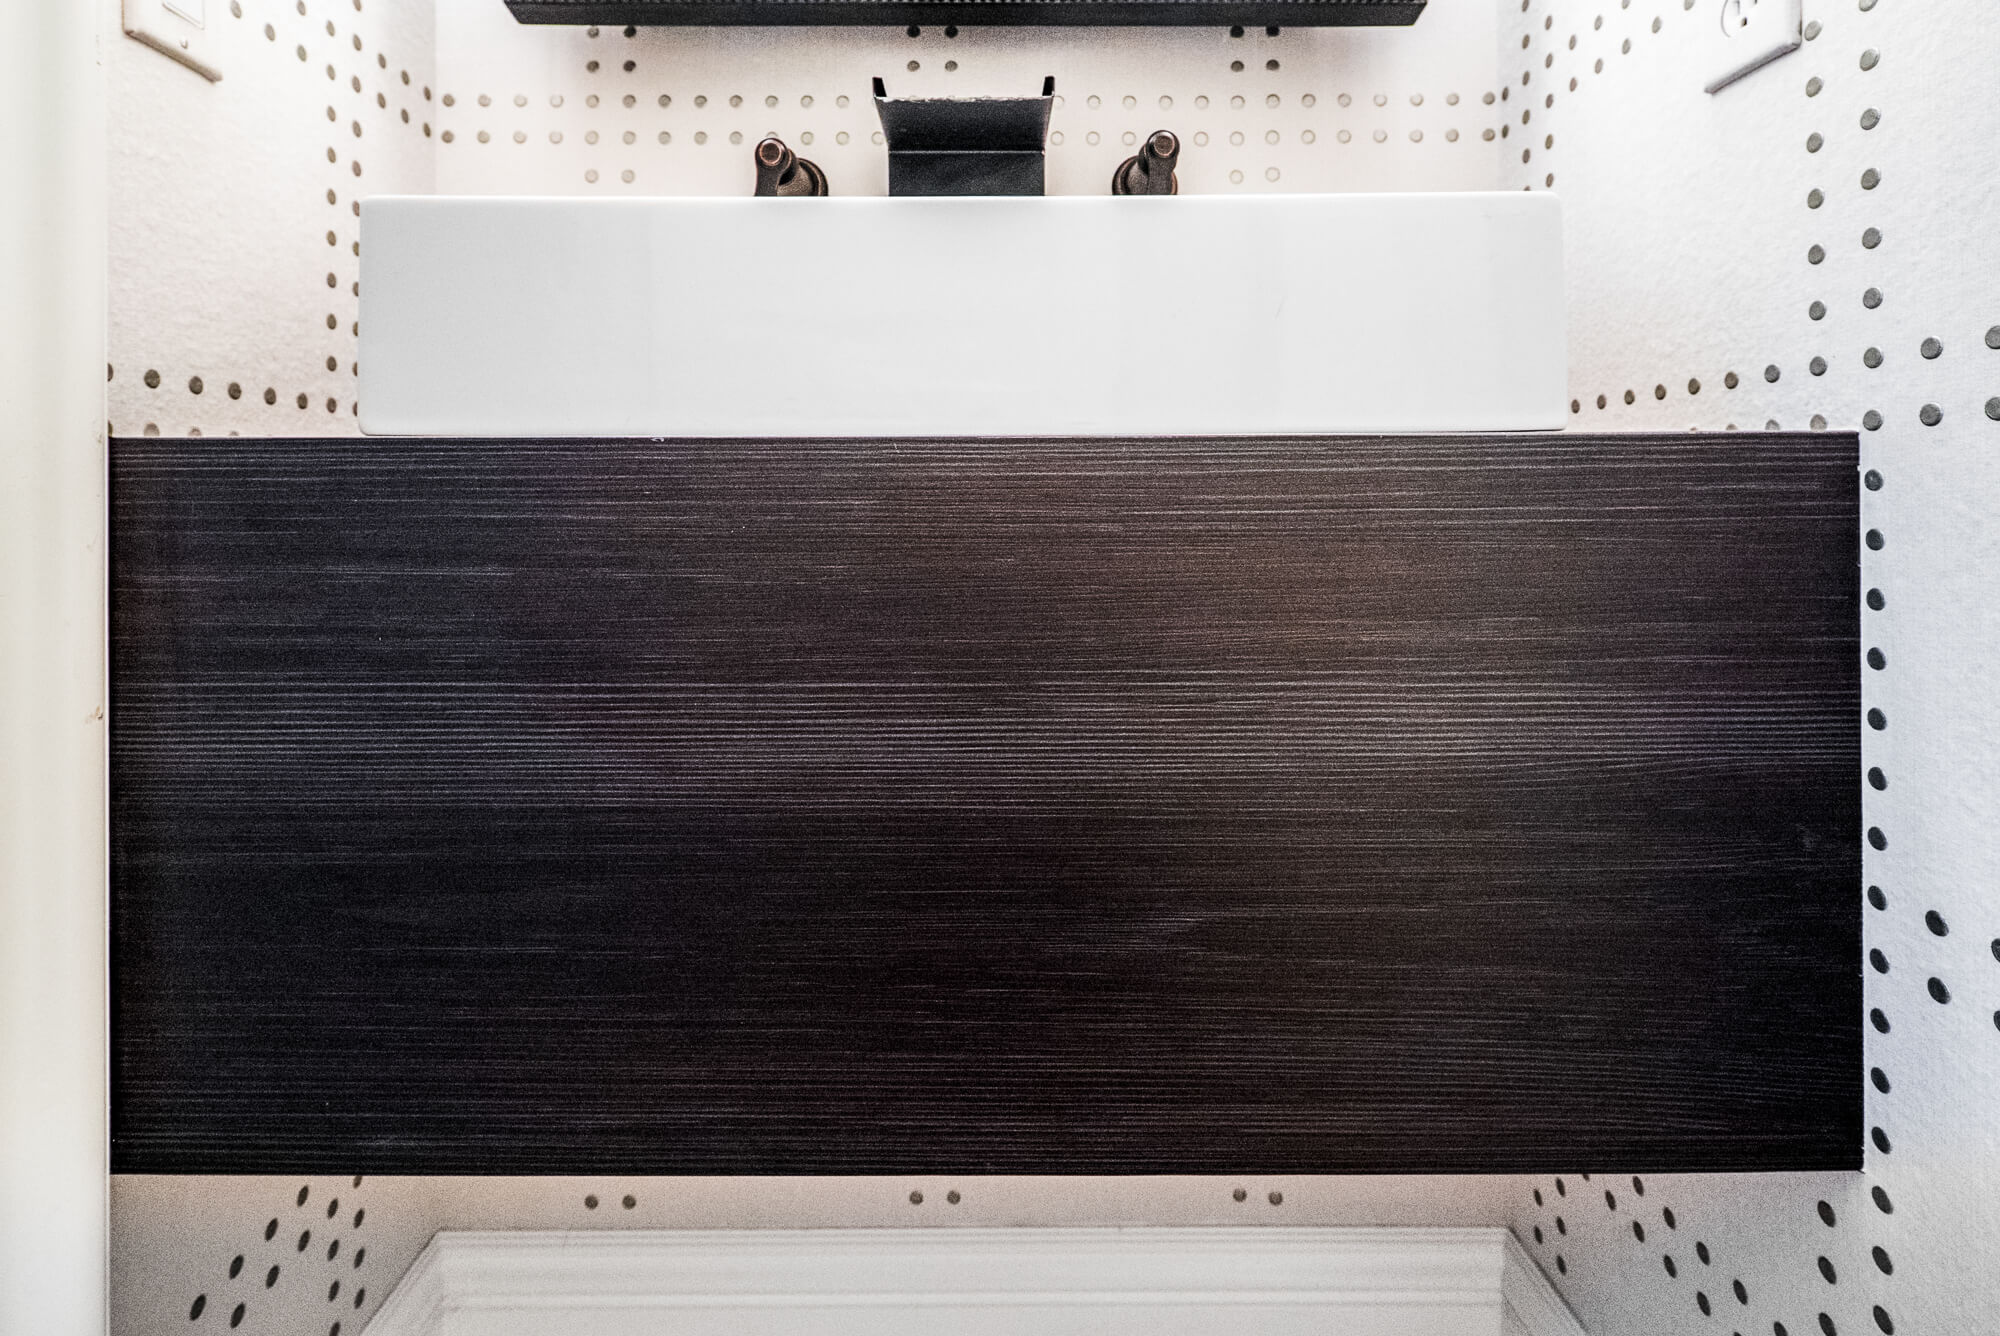 Floating Vanity in Powder Bathroom, Stylish Floating Vanity in Powder Bathroom, Powder Bathroom Remodel in Orange County